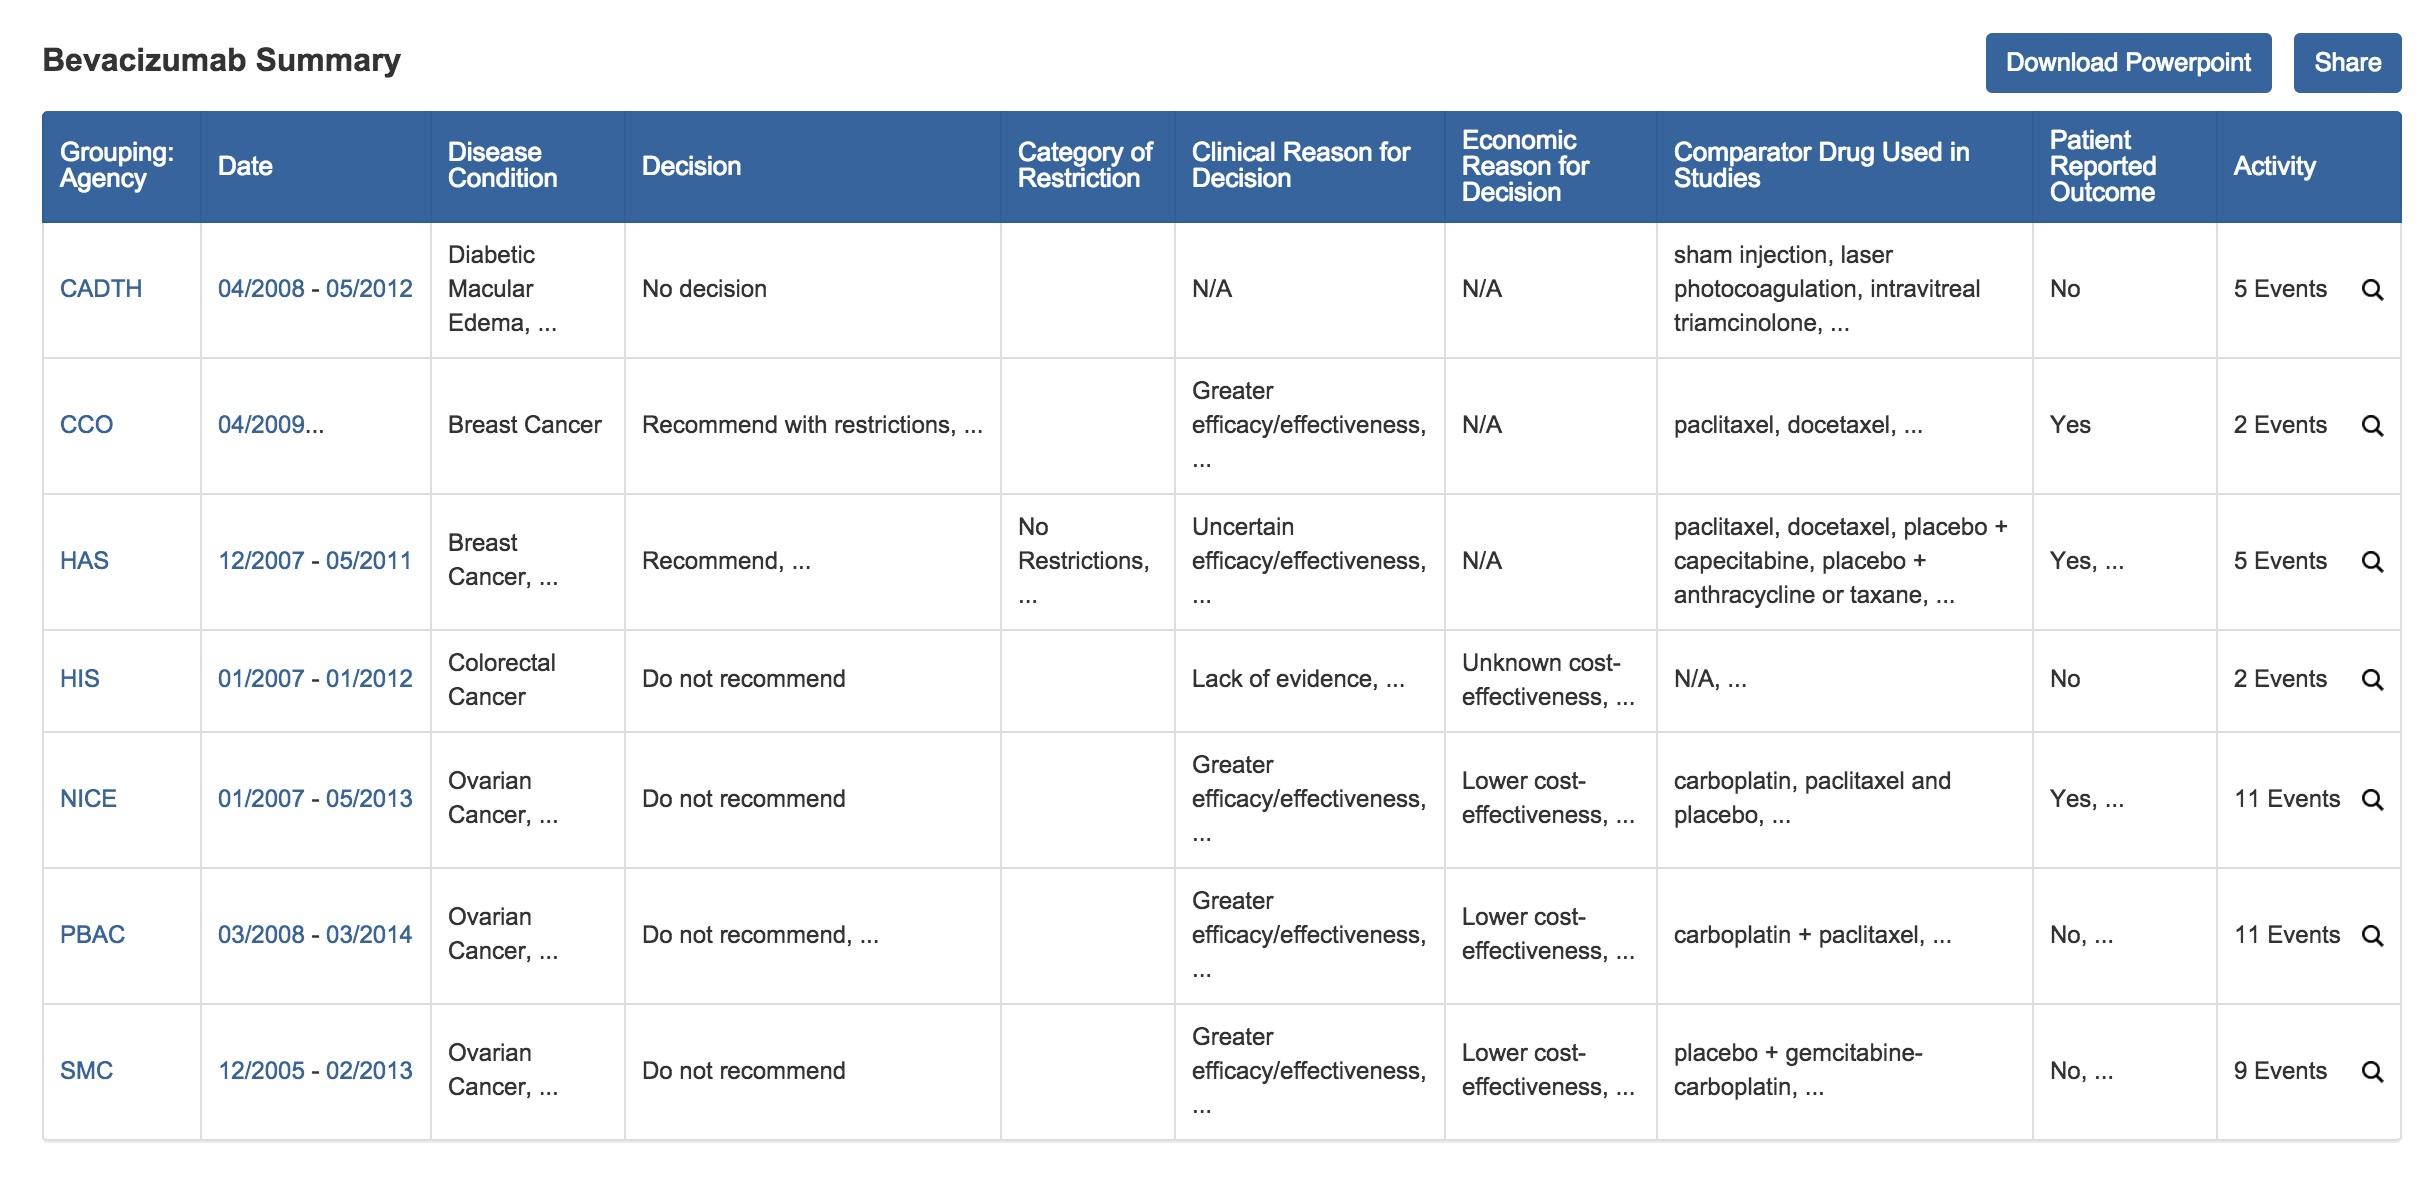 Create a Summary Table of Clinical and Economic Evaluations for Avastin (Bevacizumab)